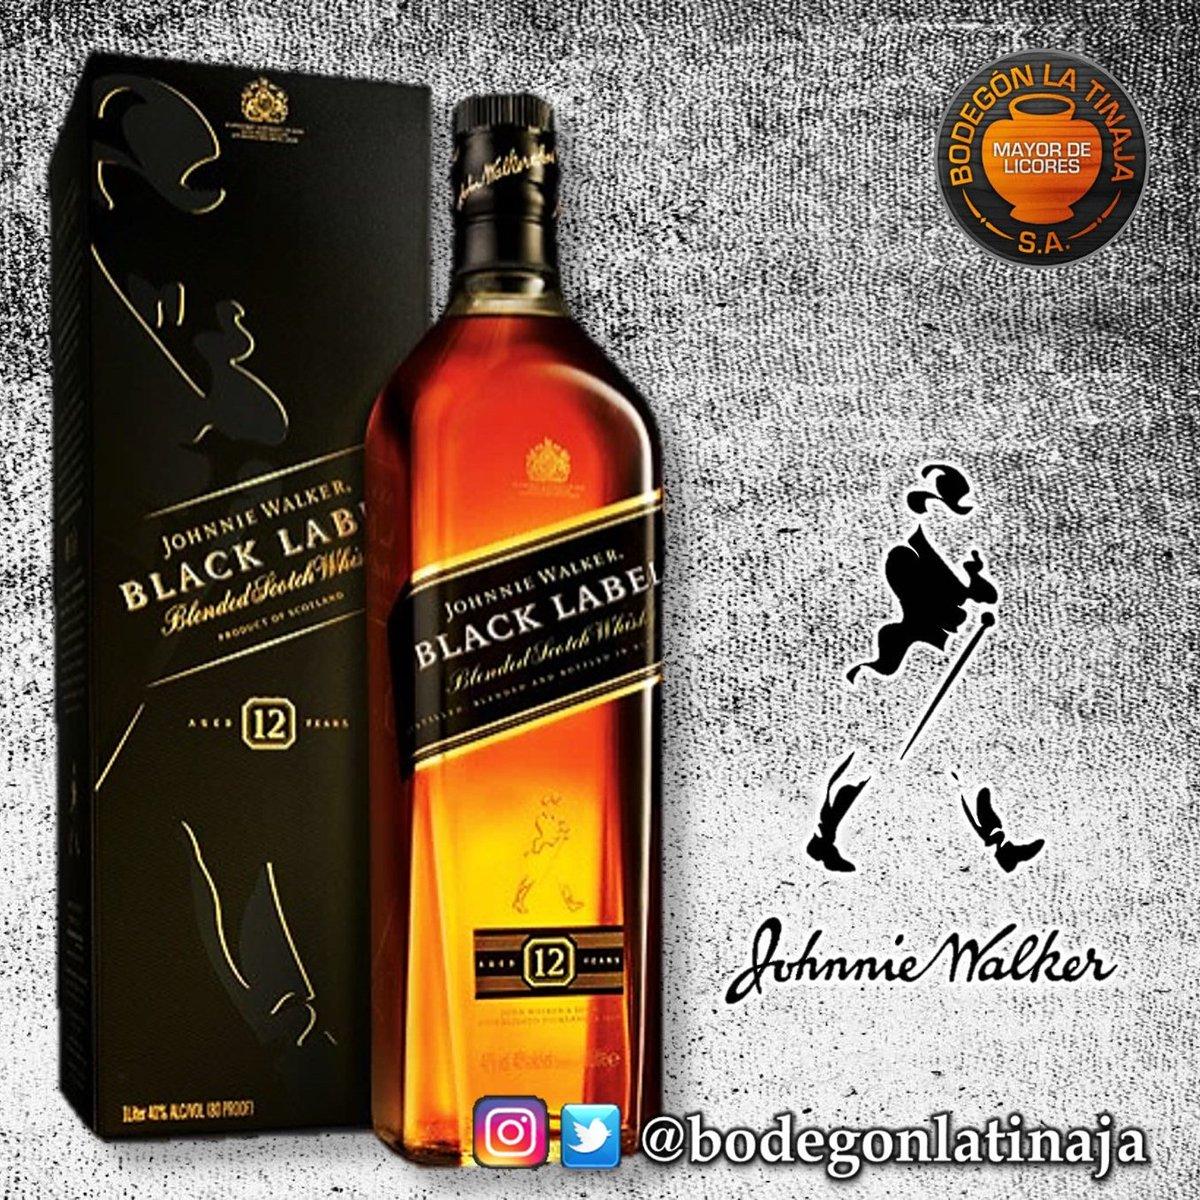 #BlendedScotchWhisky #JhonnyWalker #BlackLabel #EtiquetaNegra a un excelente precio... #BodegonLaTinaja en la 72.<br>http://pic.twitter.com/qsHk0yK0IJ